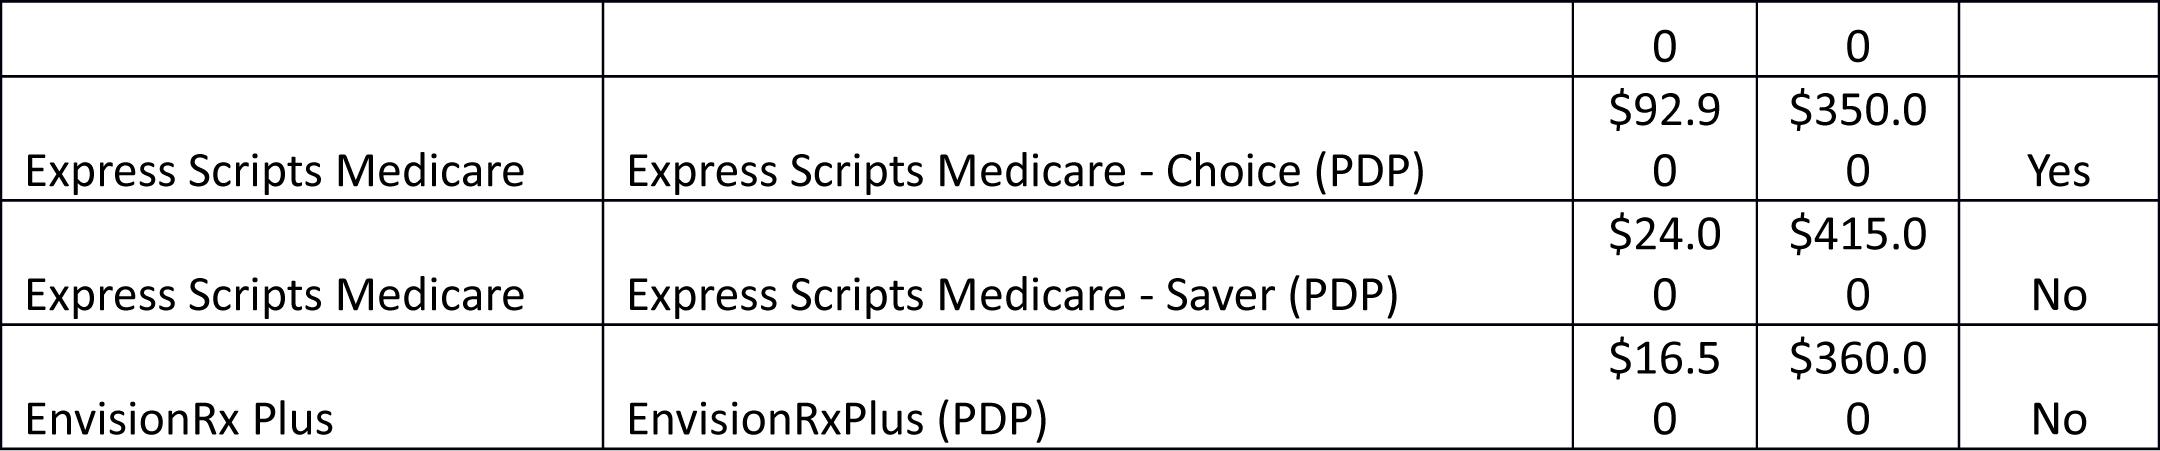 Choose Your 2019 Prescription Drug Plan | News, Sports